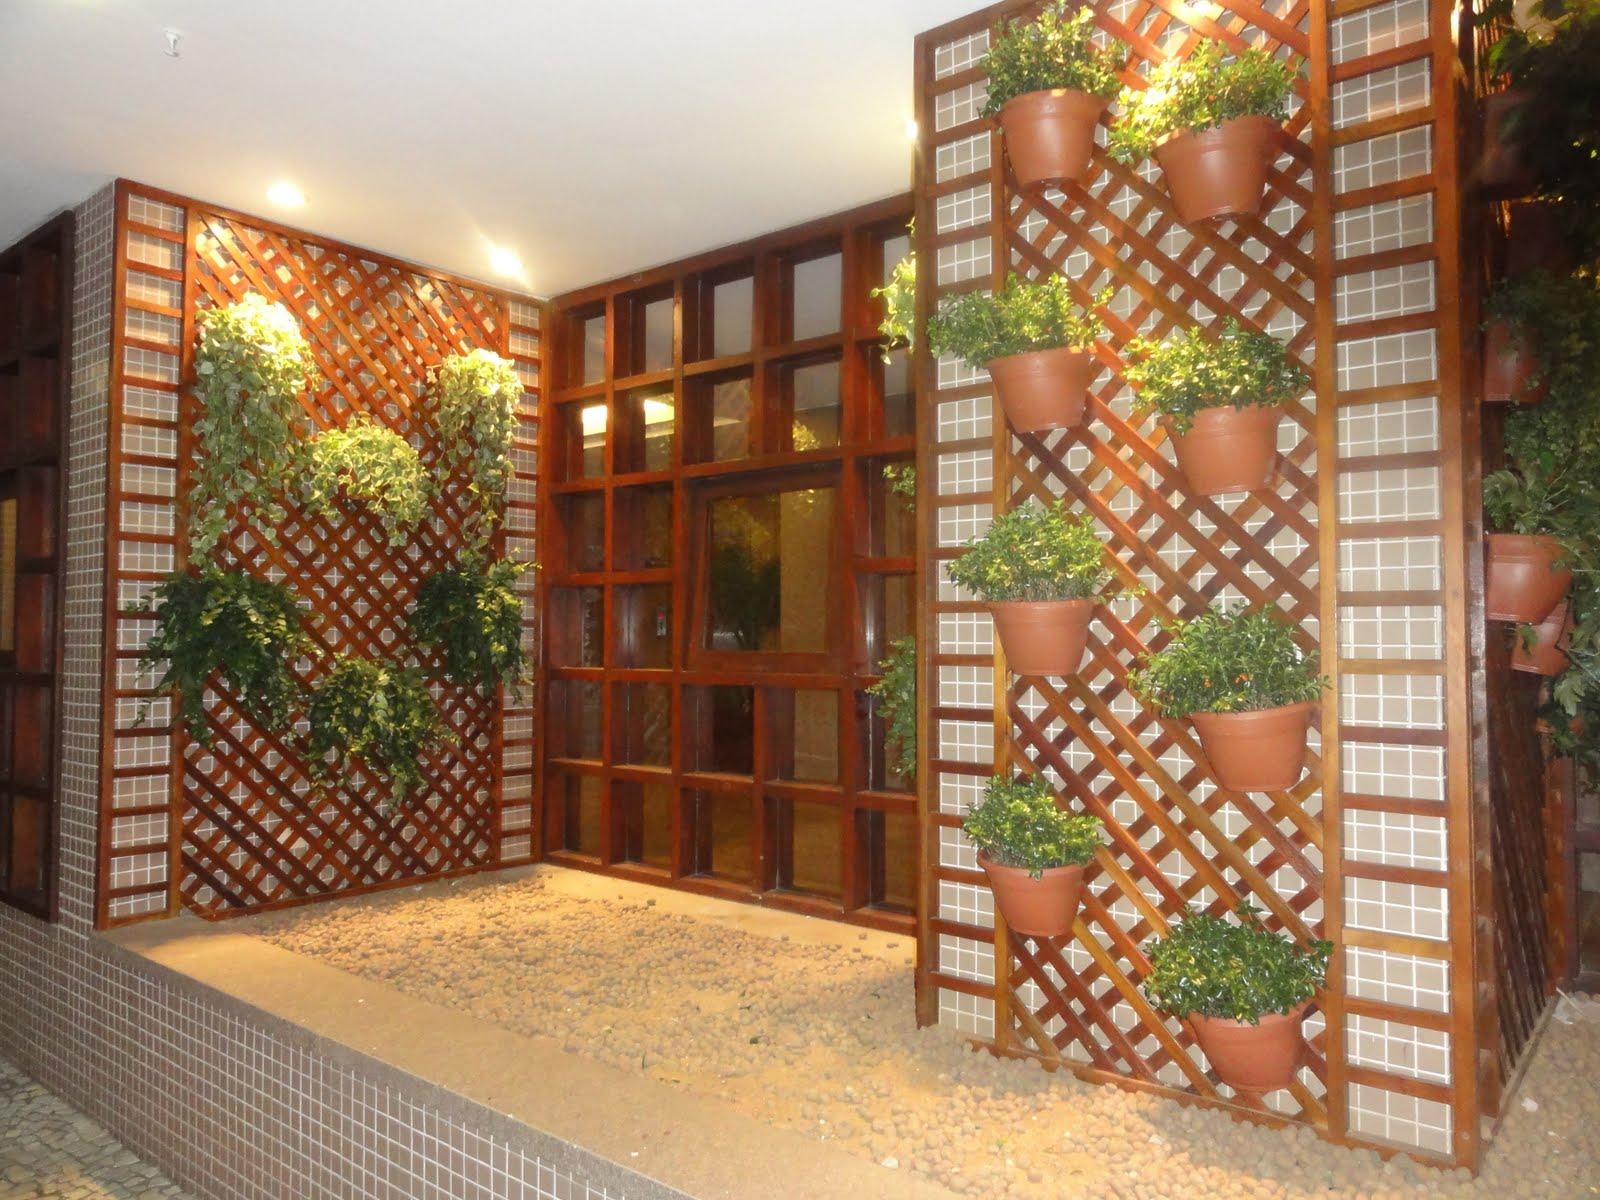 jardim vertical em muro:Jardim vertical